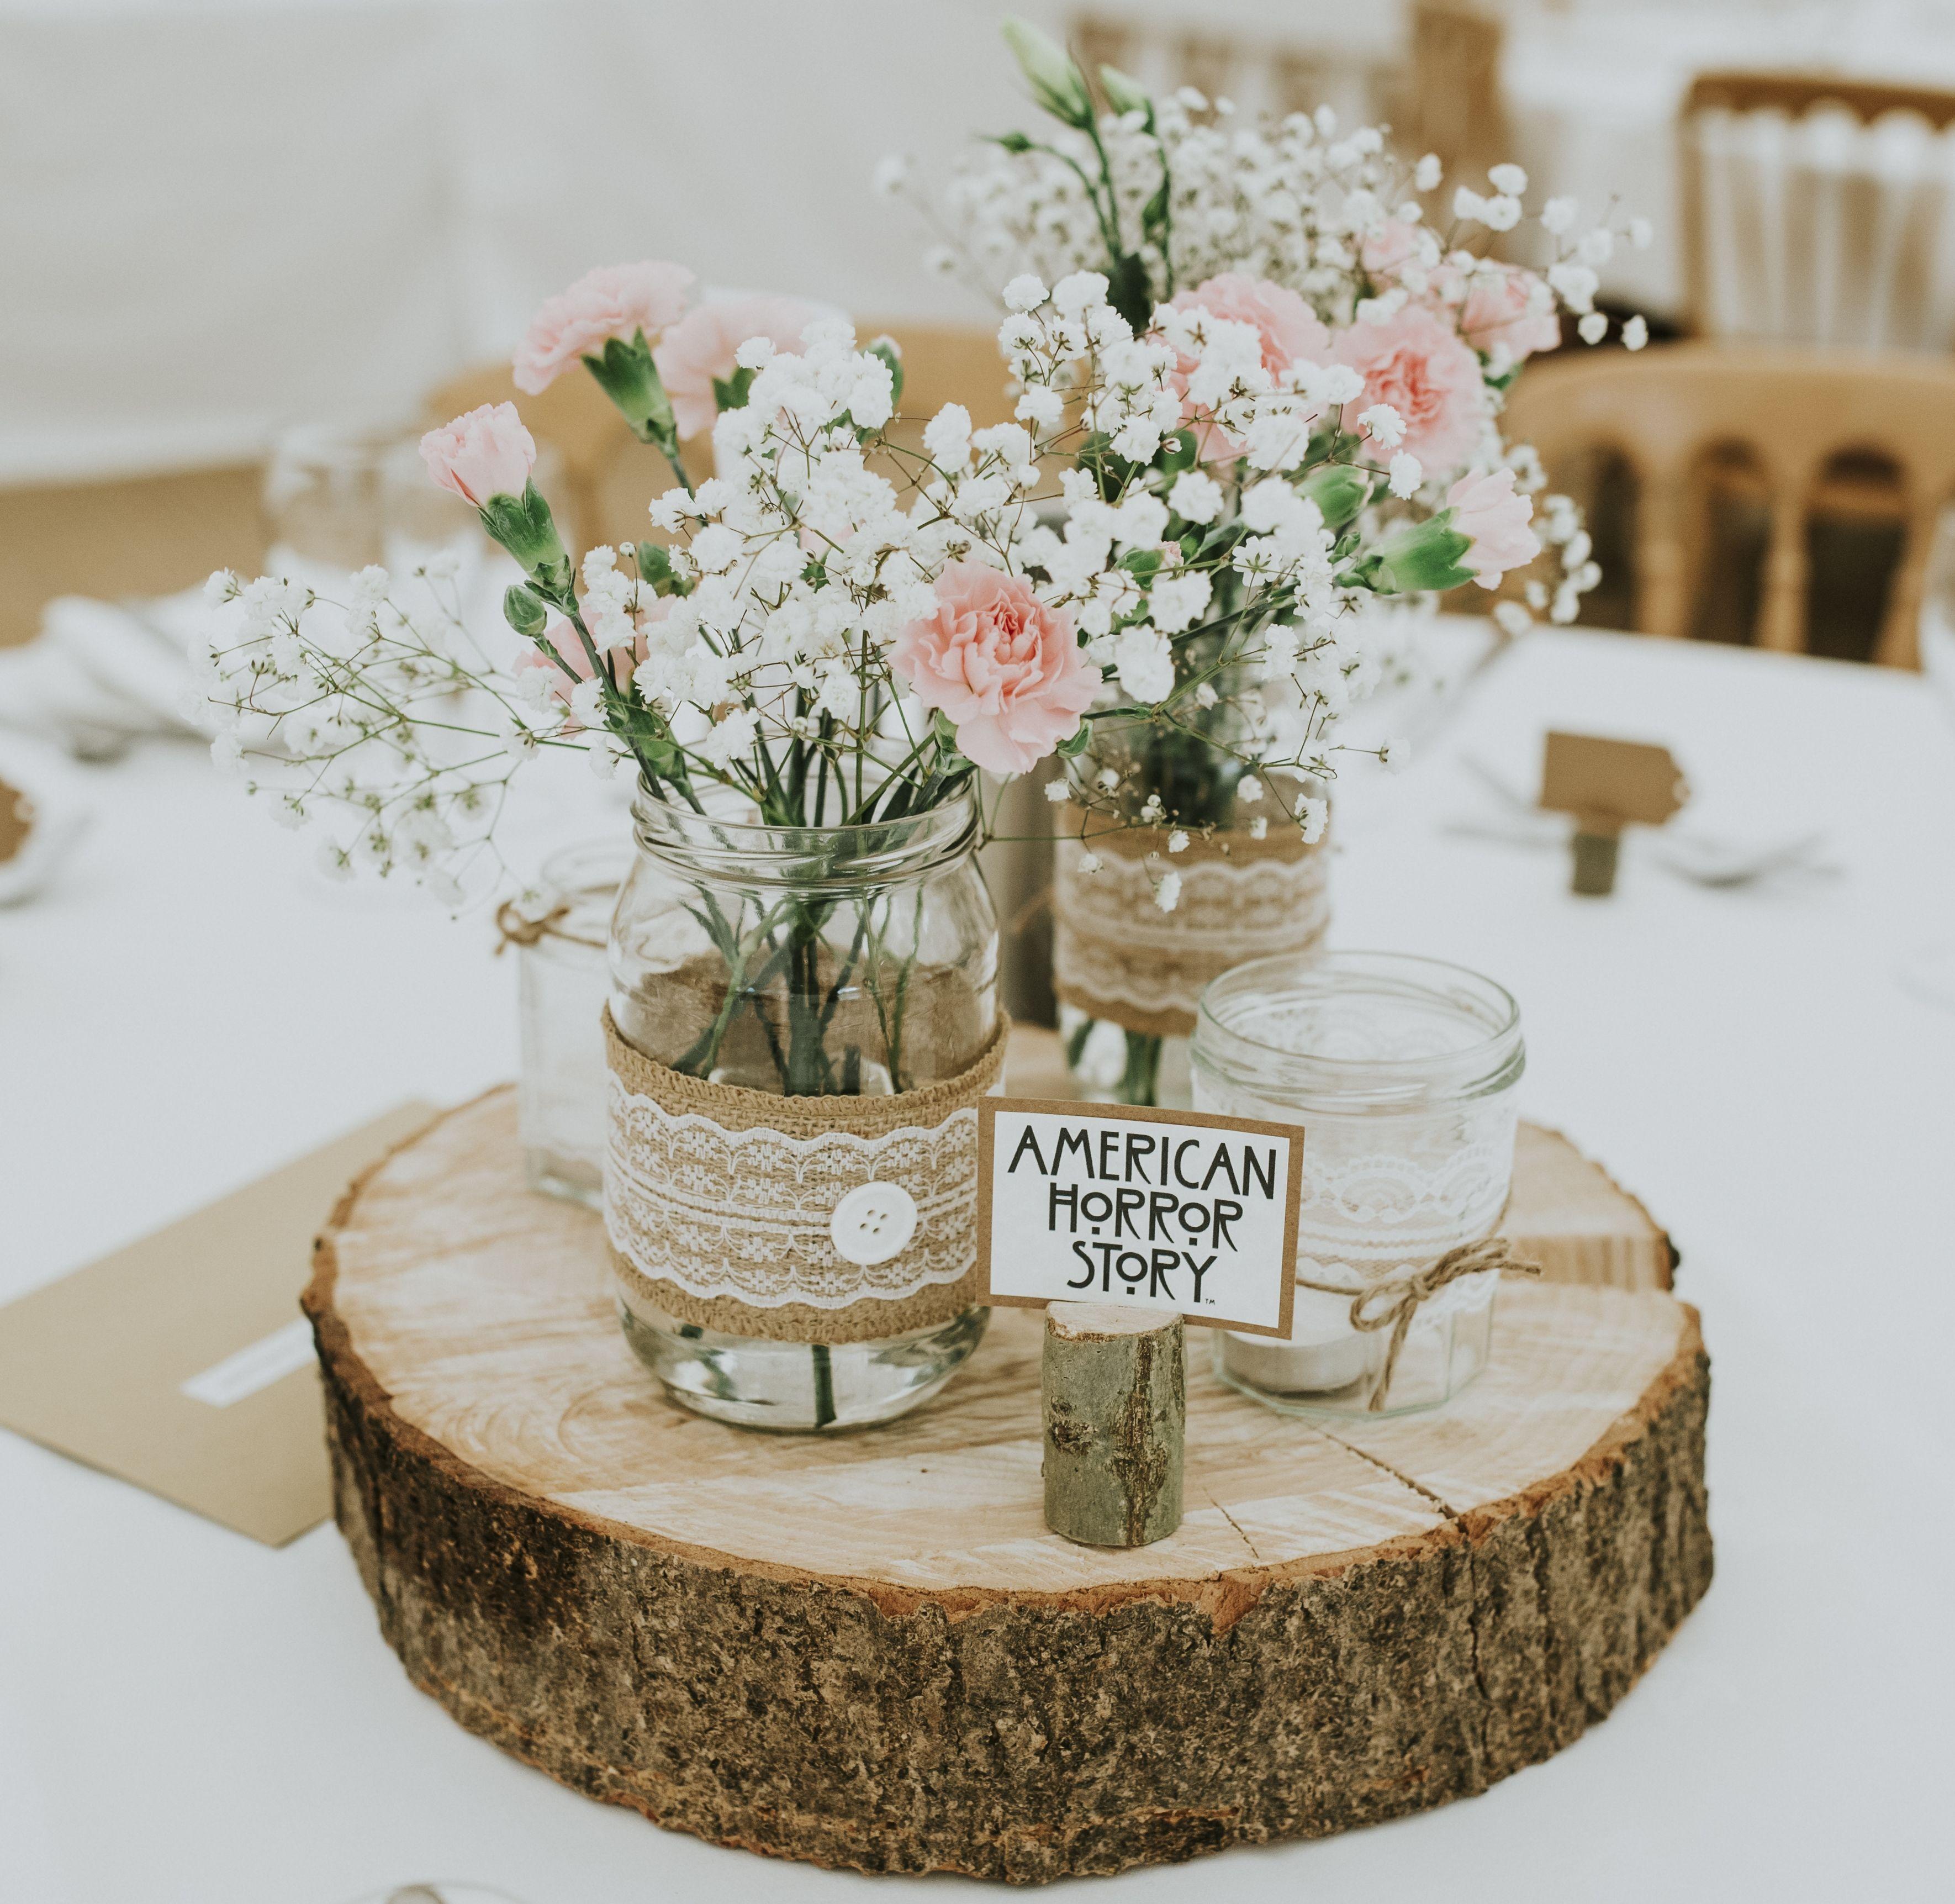 Wedding Centerpiece: Jam jars, hessian, lace on log slices ...